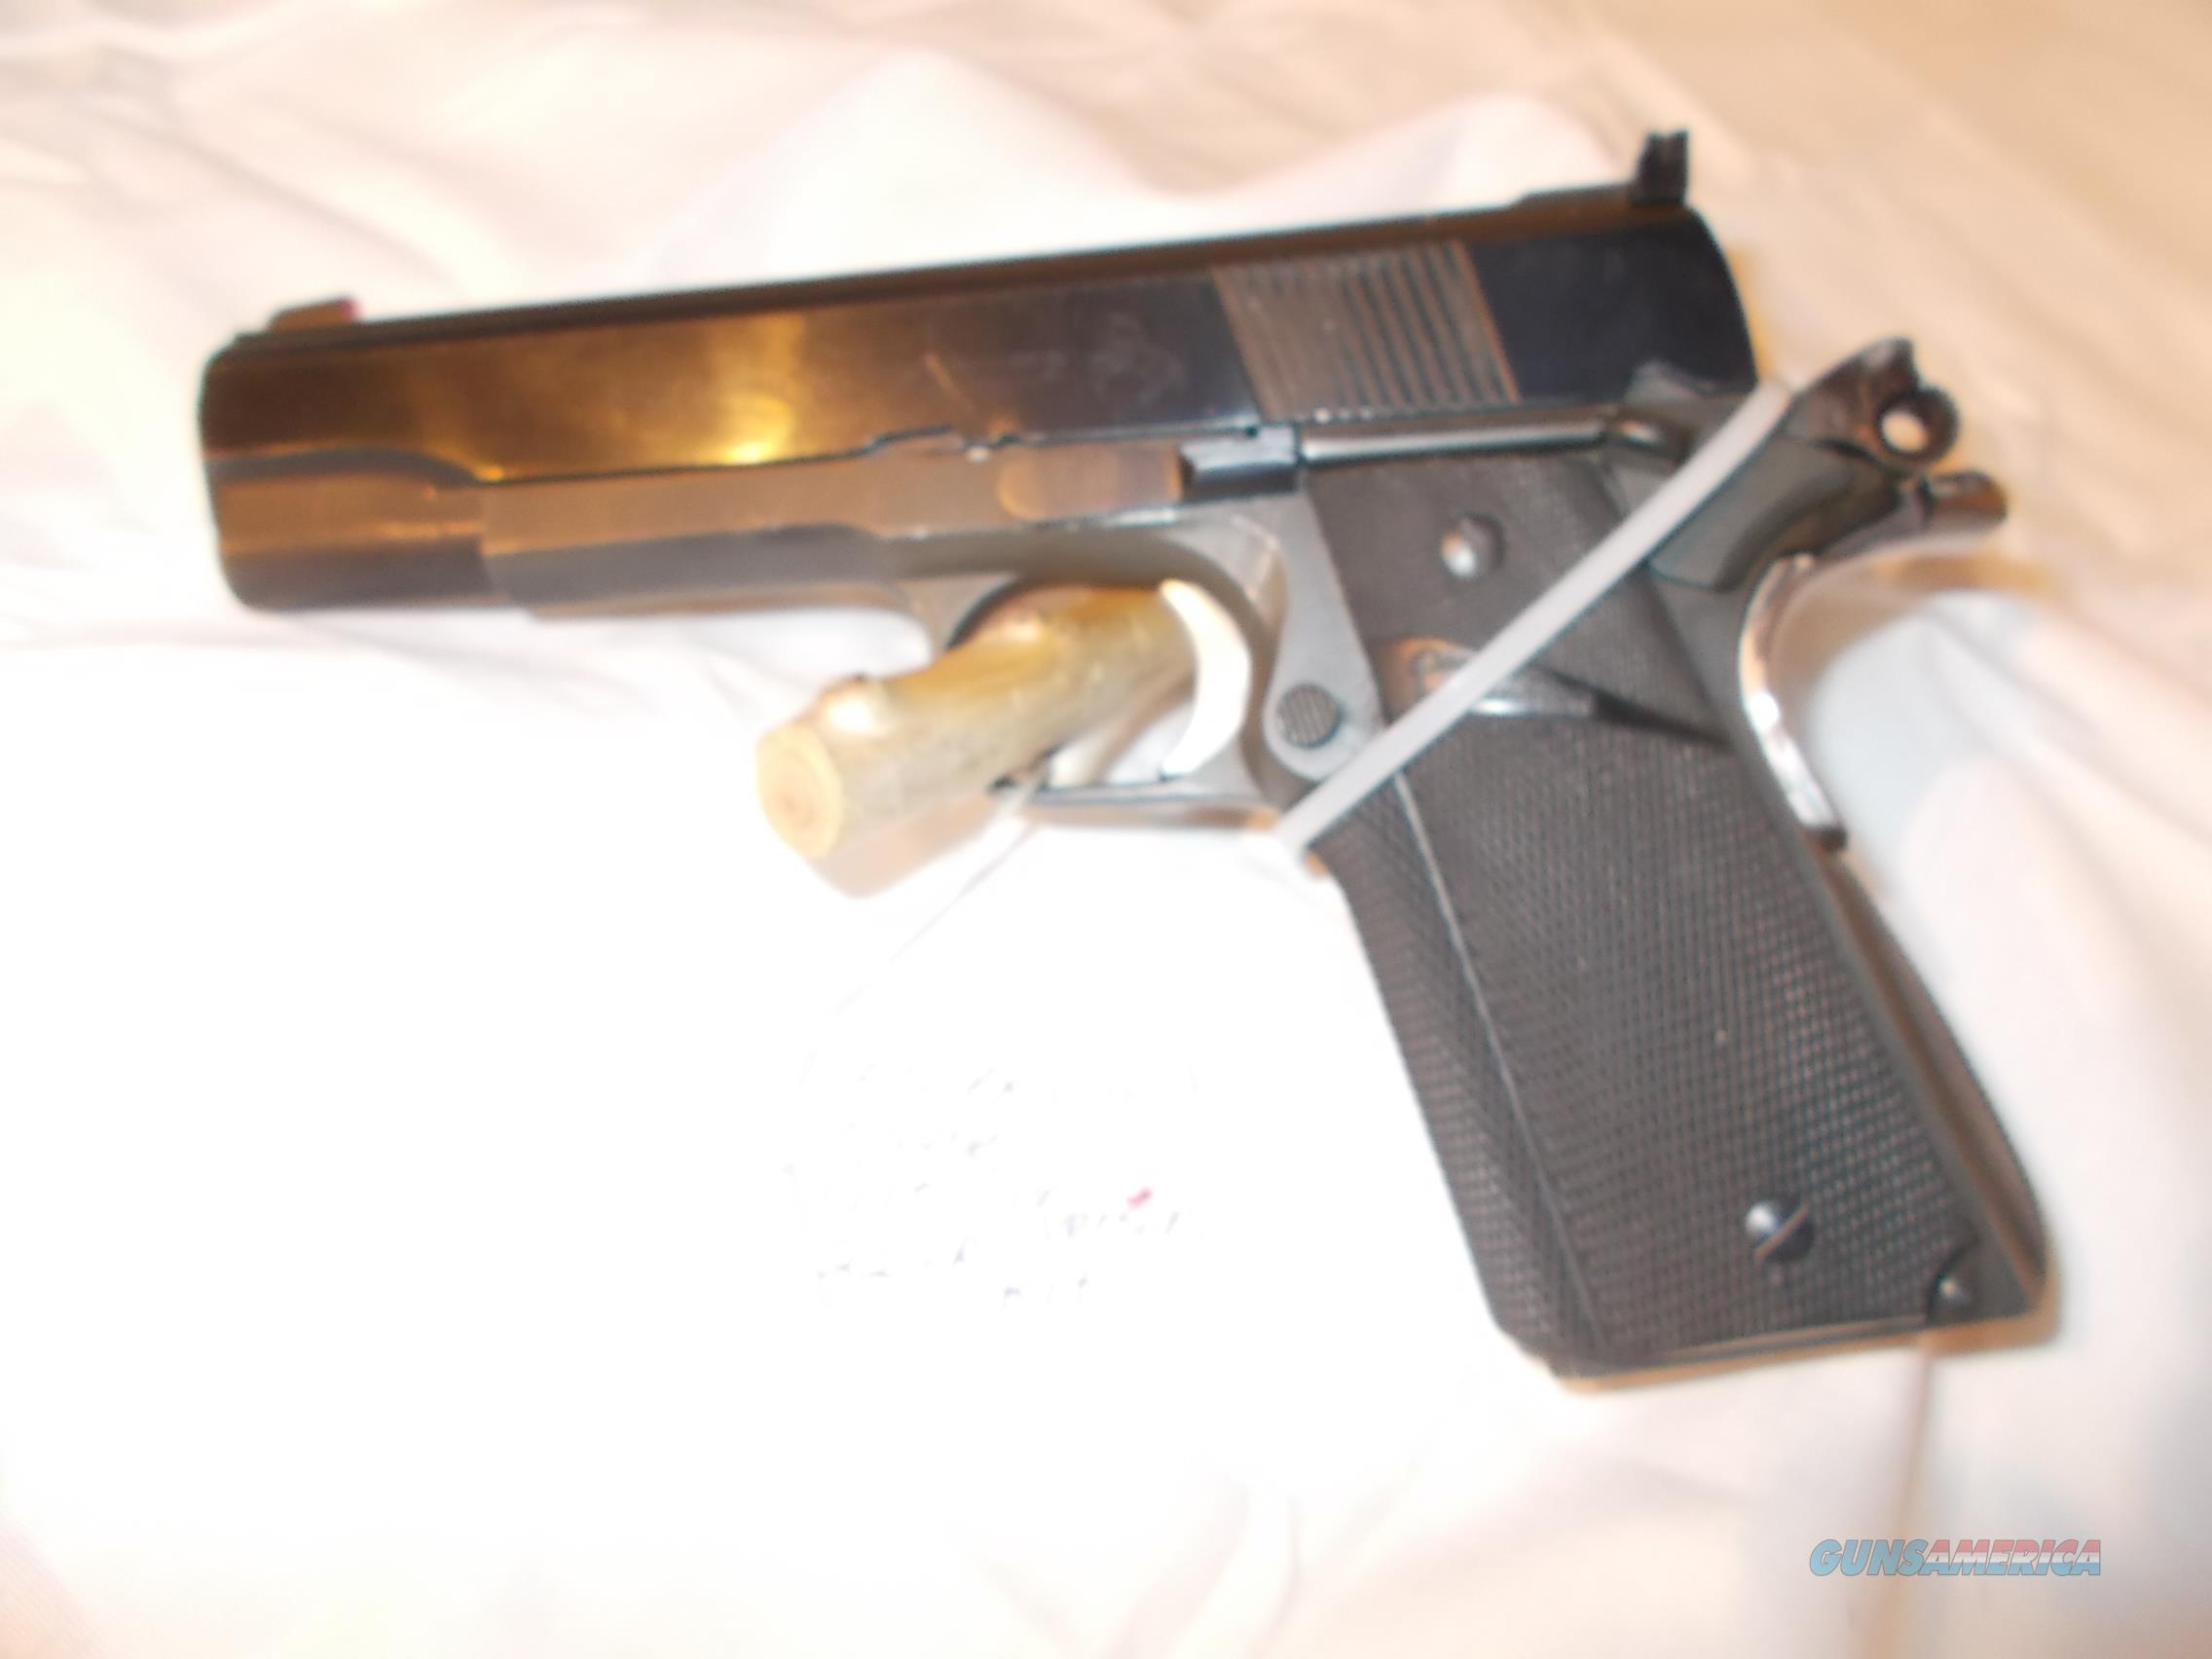 colt slide on essex frame 1911 22lr  Guns > Pistols > Colt Automatic Pistols (22 Cal.)